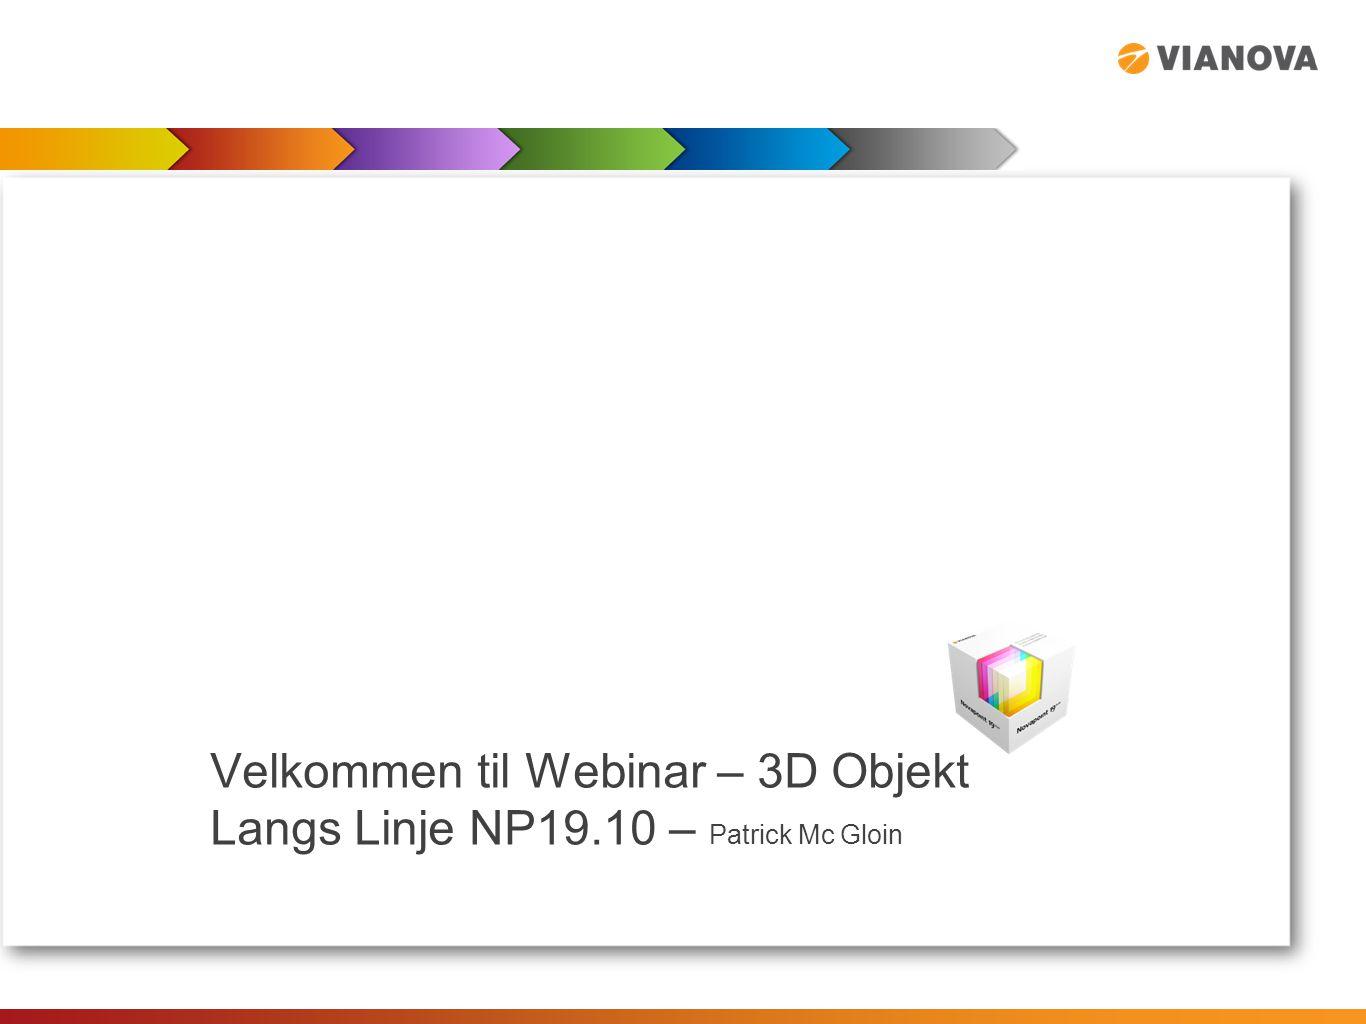 Velkommen til Webinar – 3D Objekt Langs Linje NP19.10 – Patrick Mc Gloin